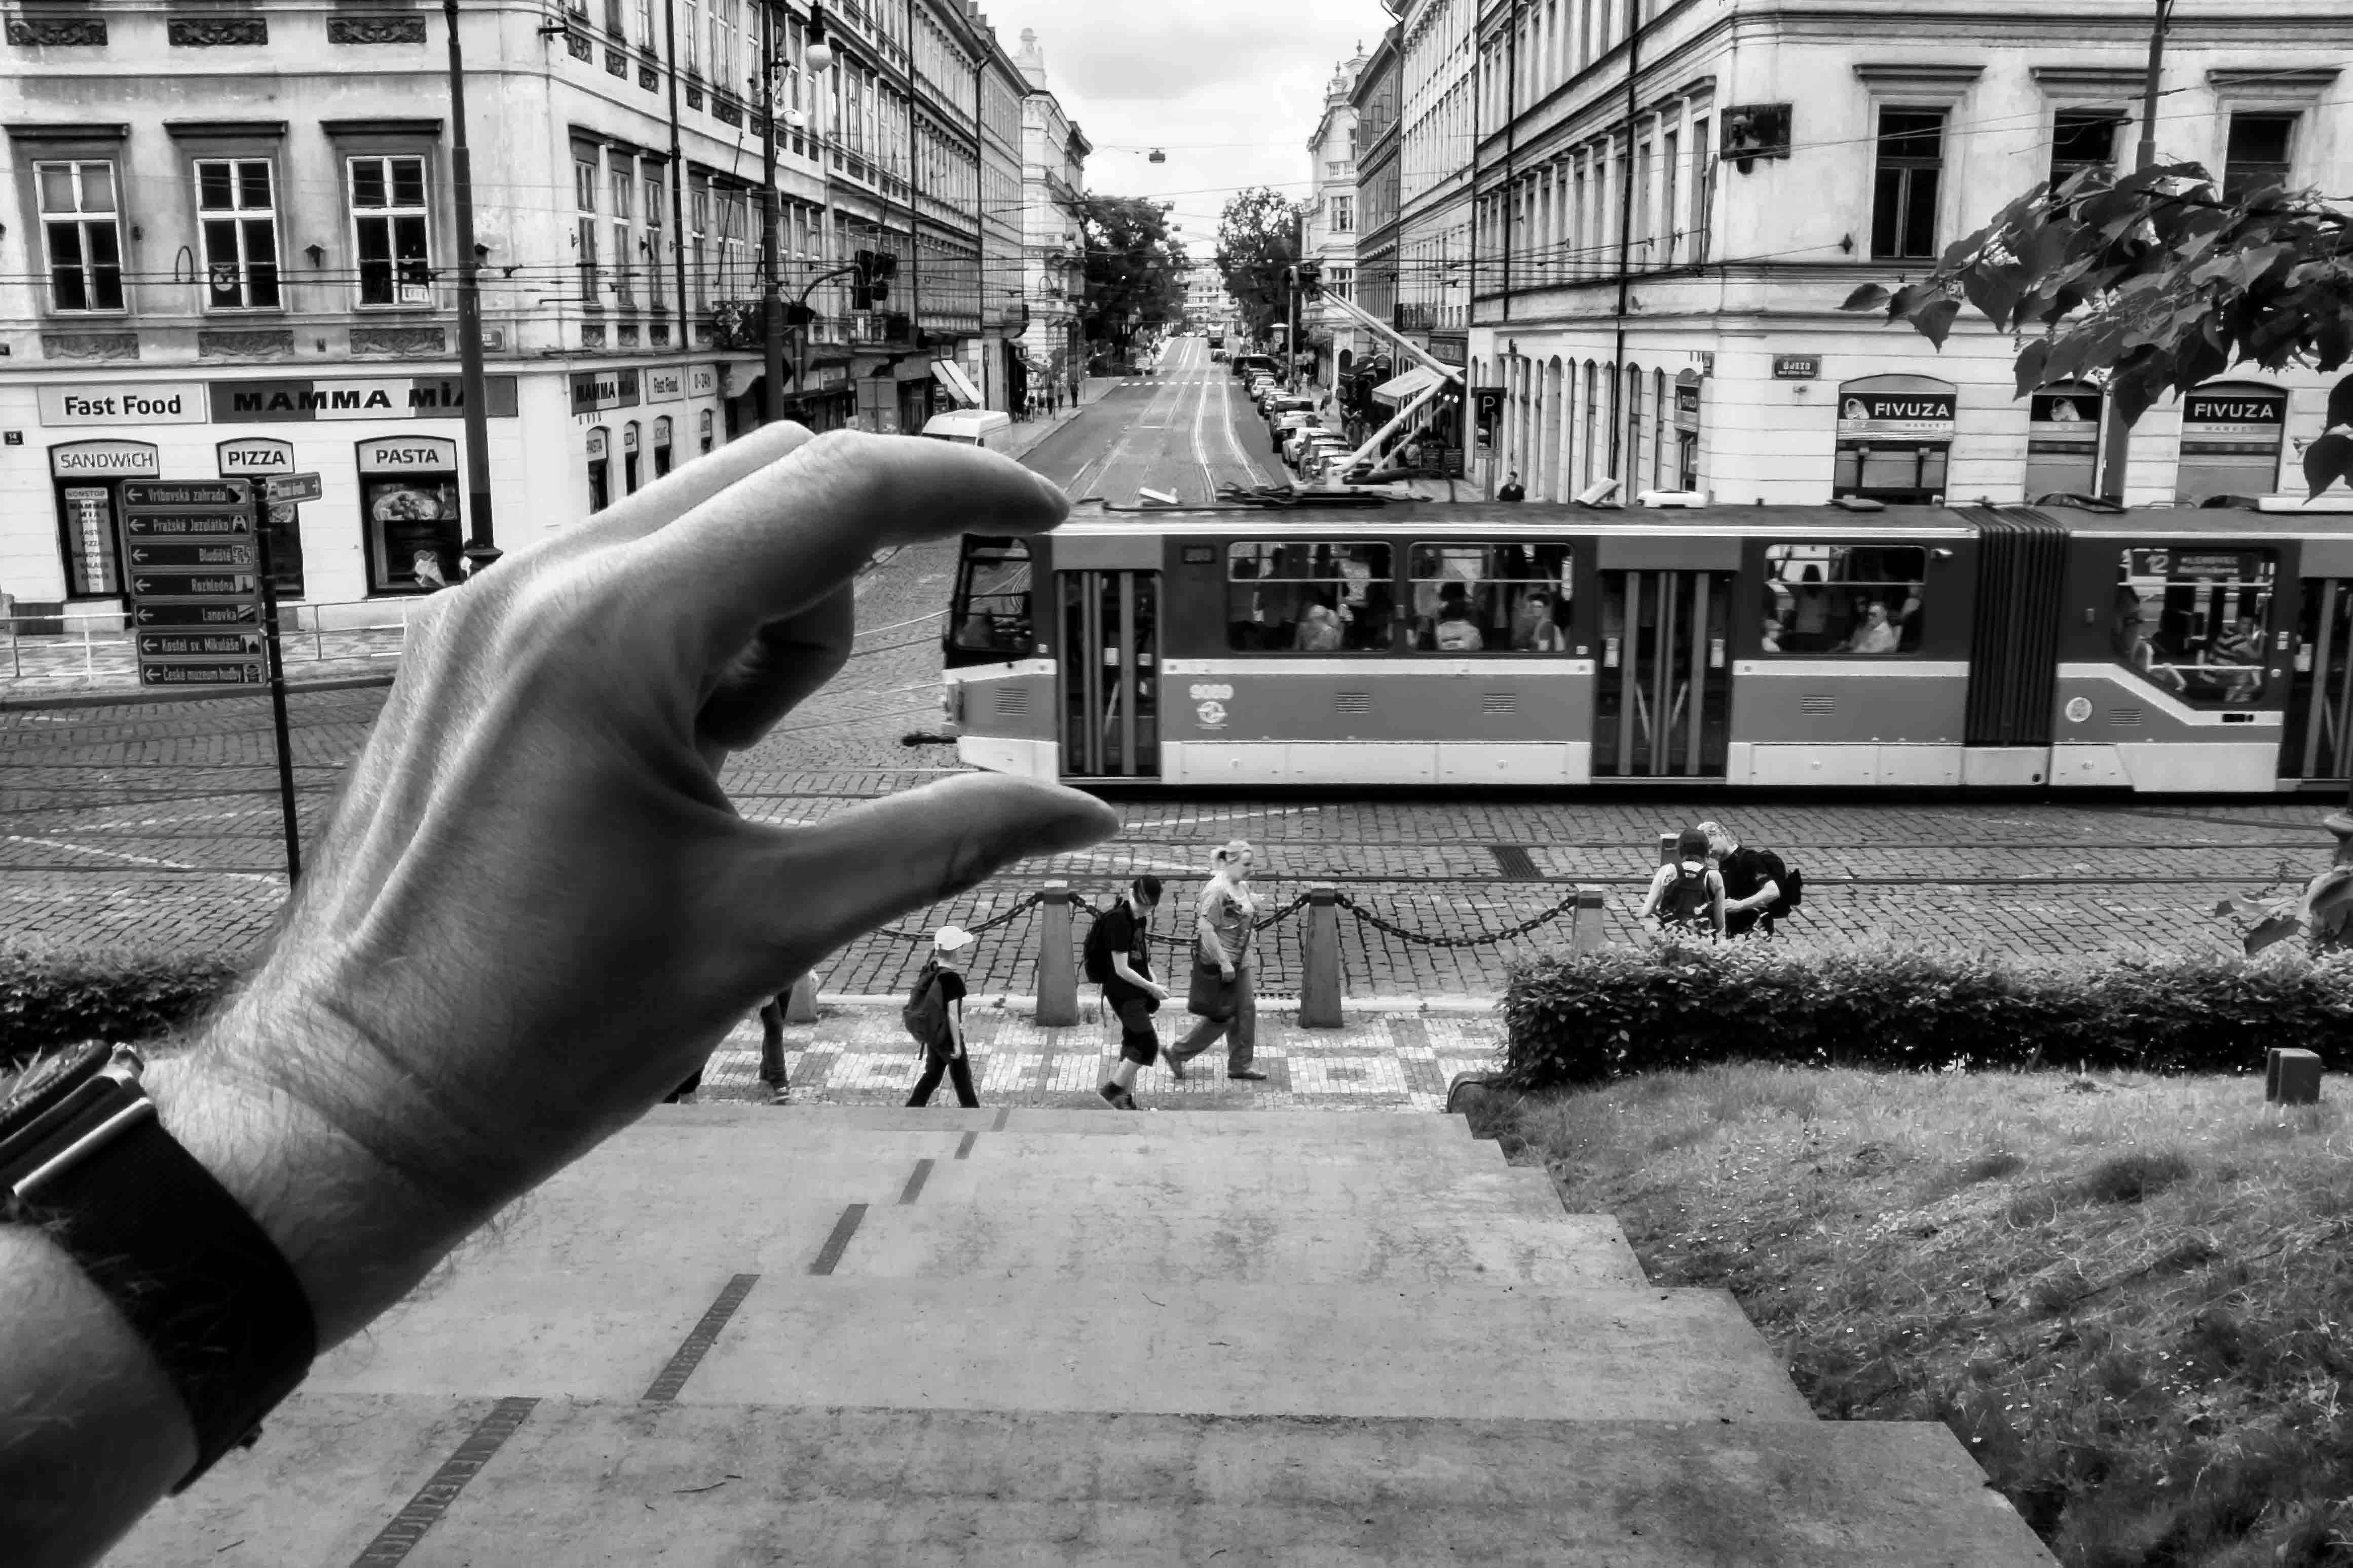 Praha tramvaj jan stojan janstojan pentax janstojan.com